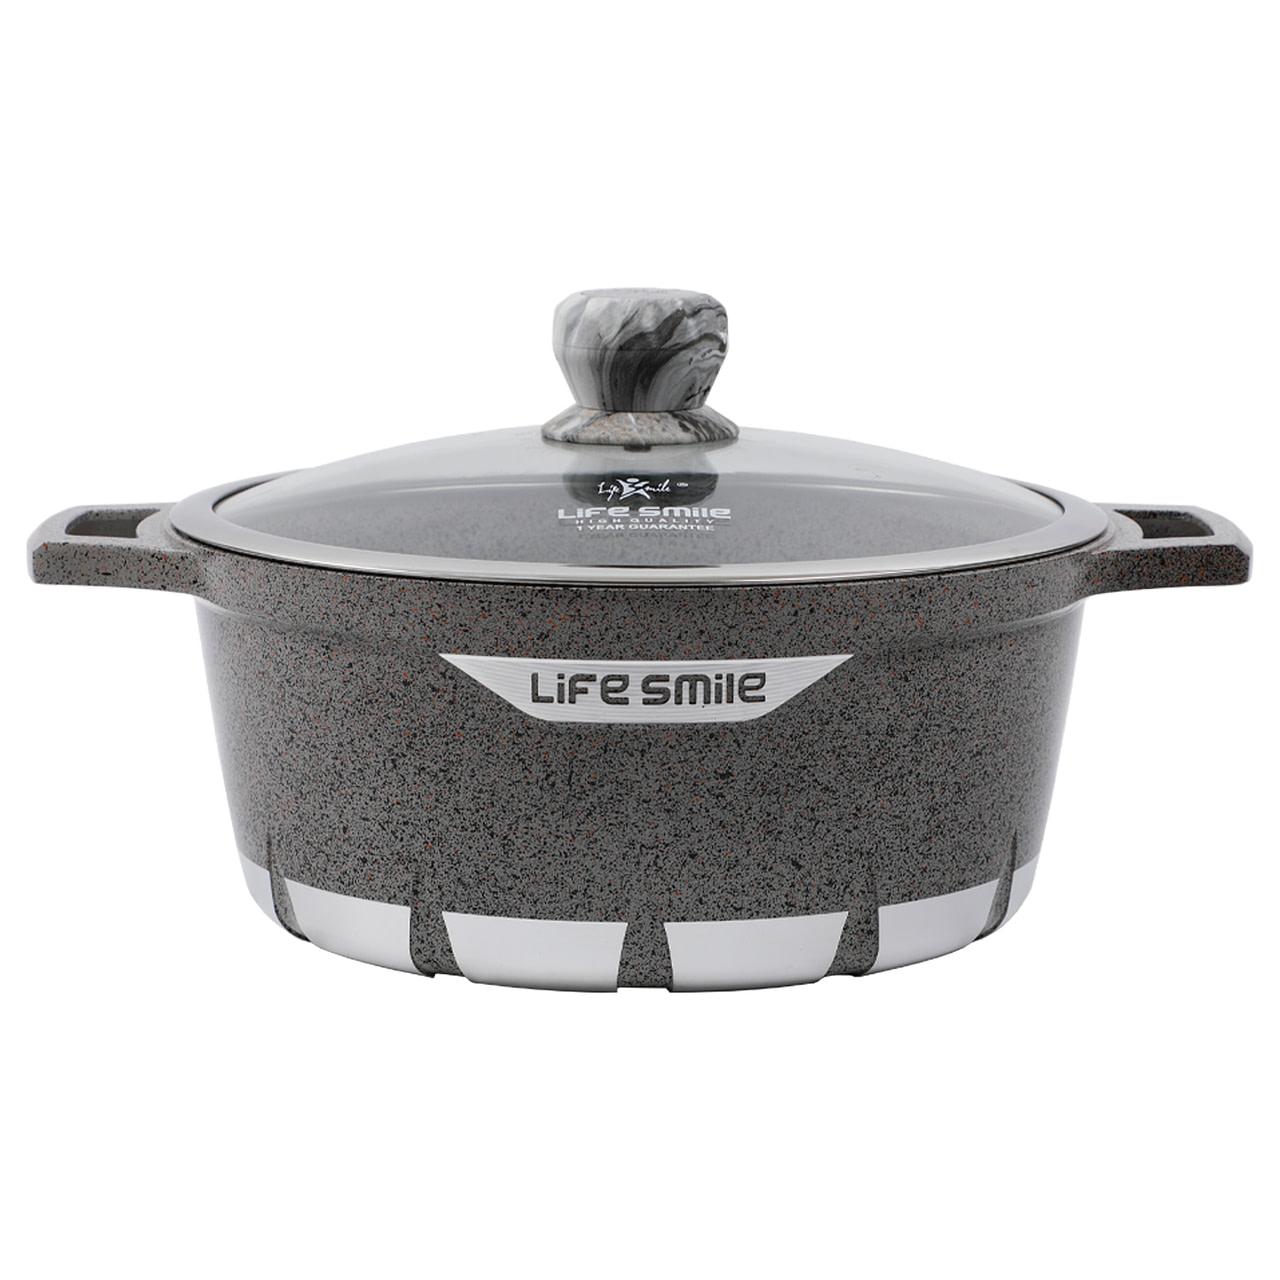 life smile Kitchenware Soup Pot